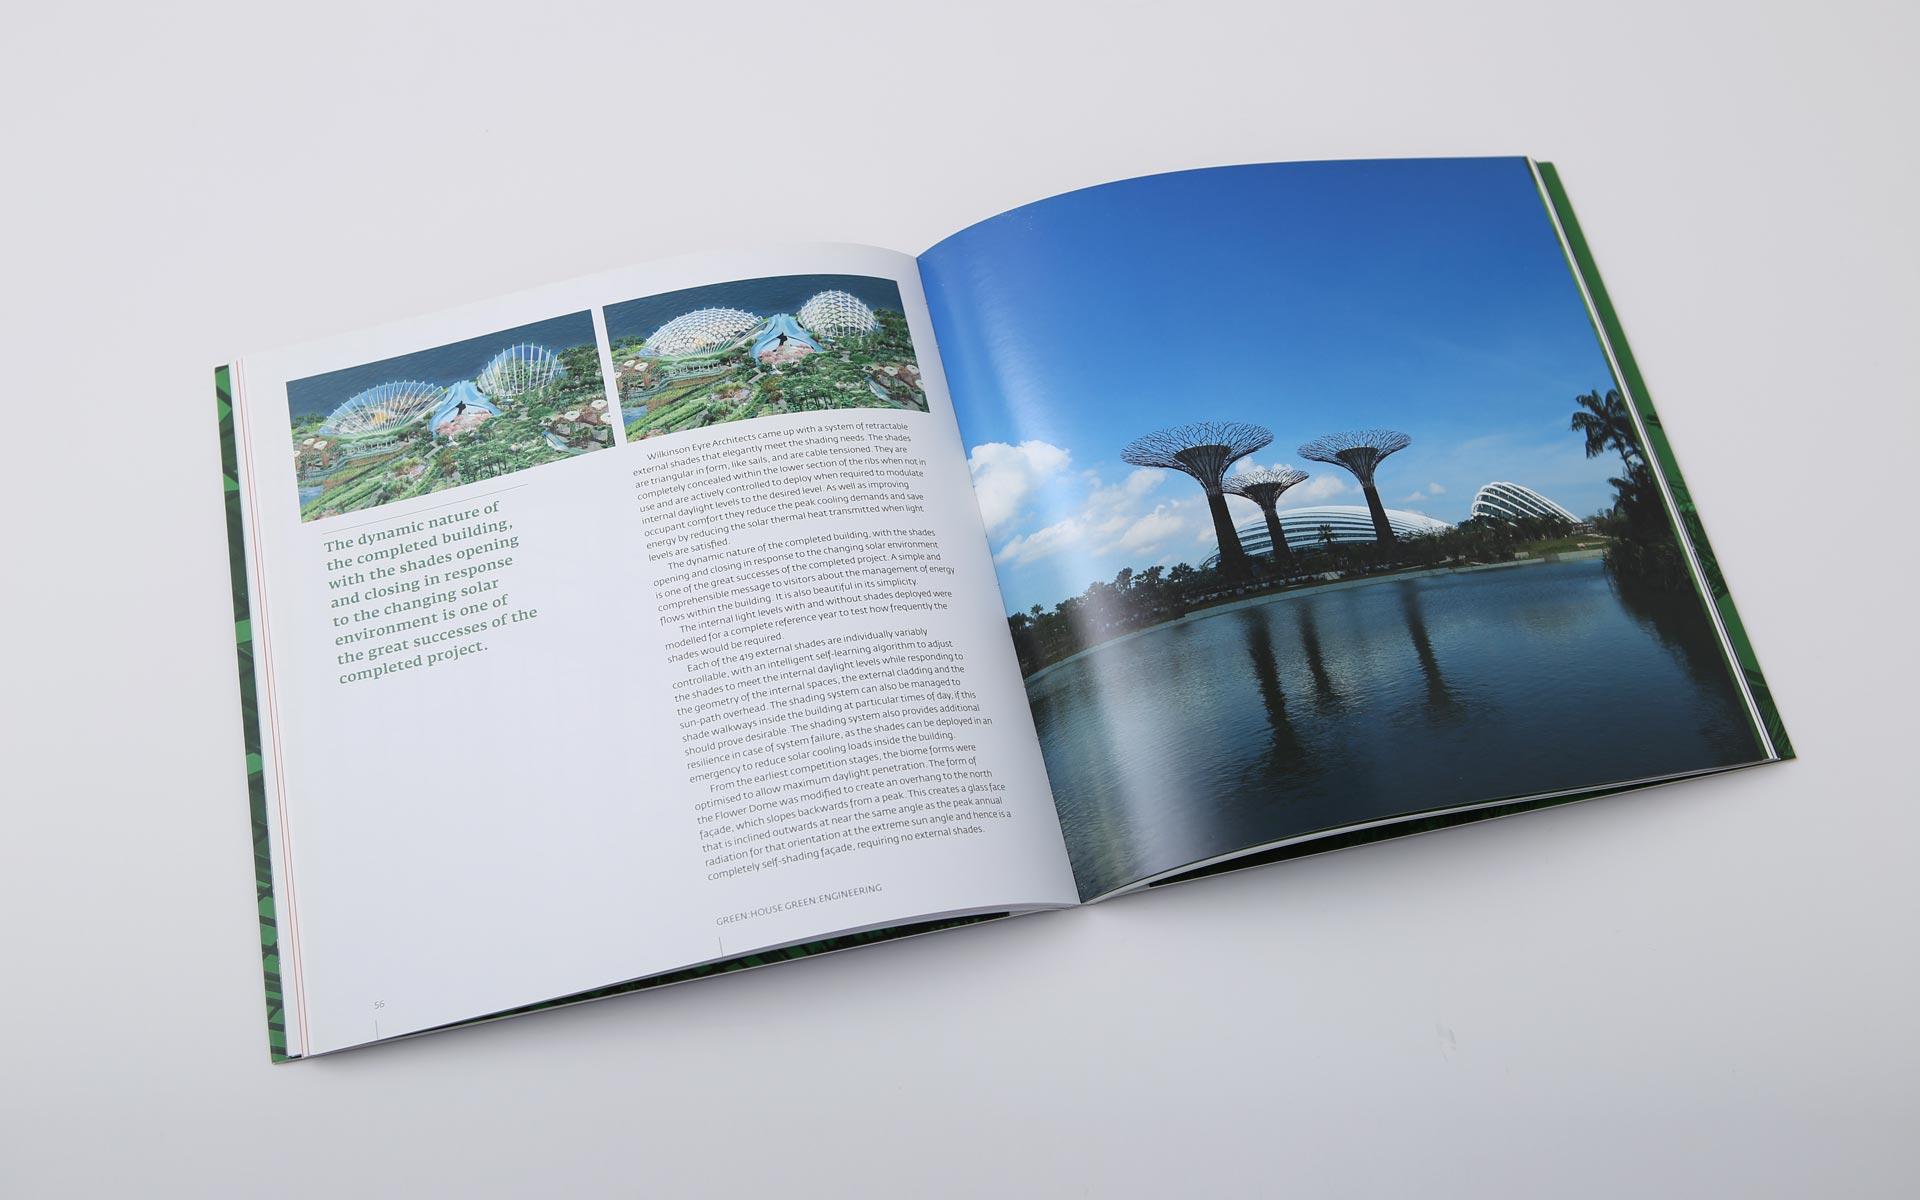 atelier-ten-book-design-6